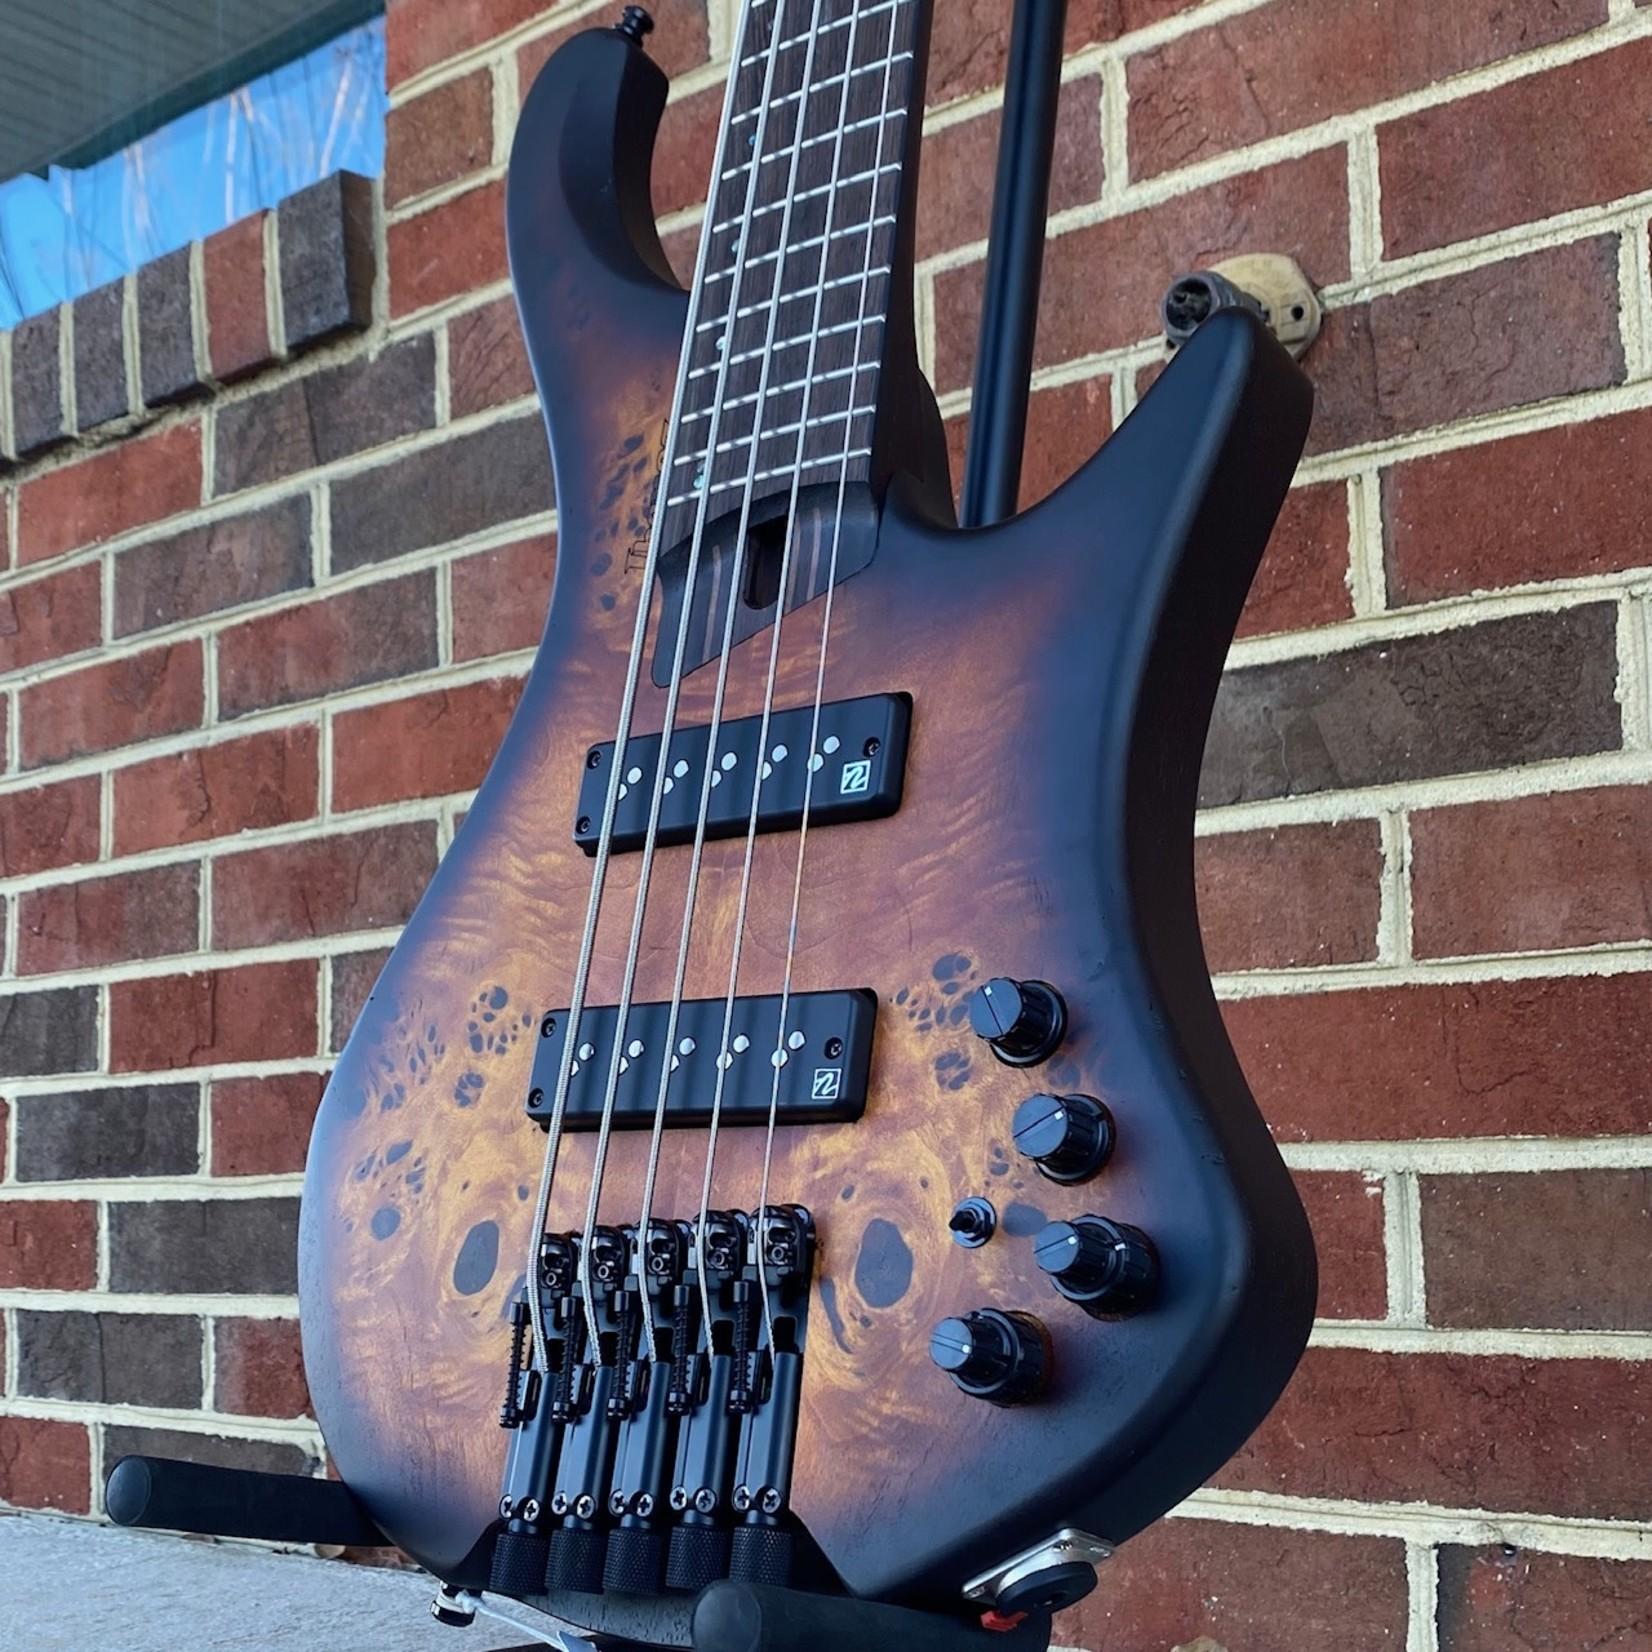 Ibanez Ibanez Bass Workshop EHB1505DEF, 5 String, Headless, Dragon Eye Burst Flat, Poplar Burl Top, Nordstrand Big Split Pickups